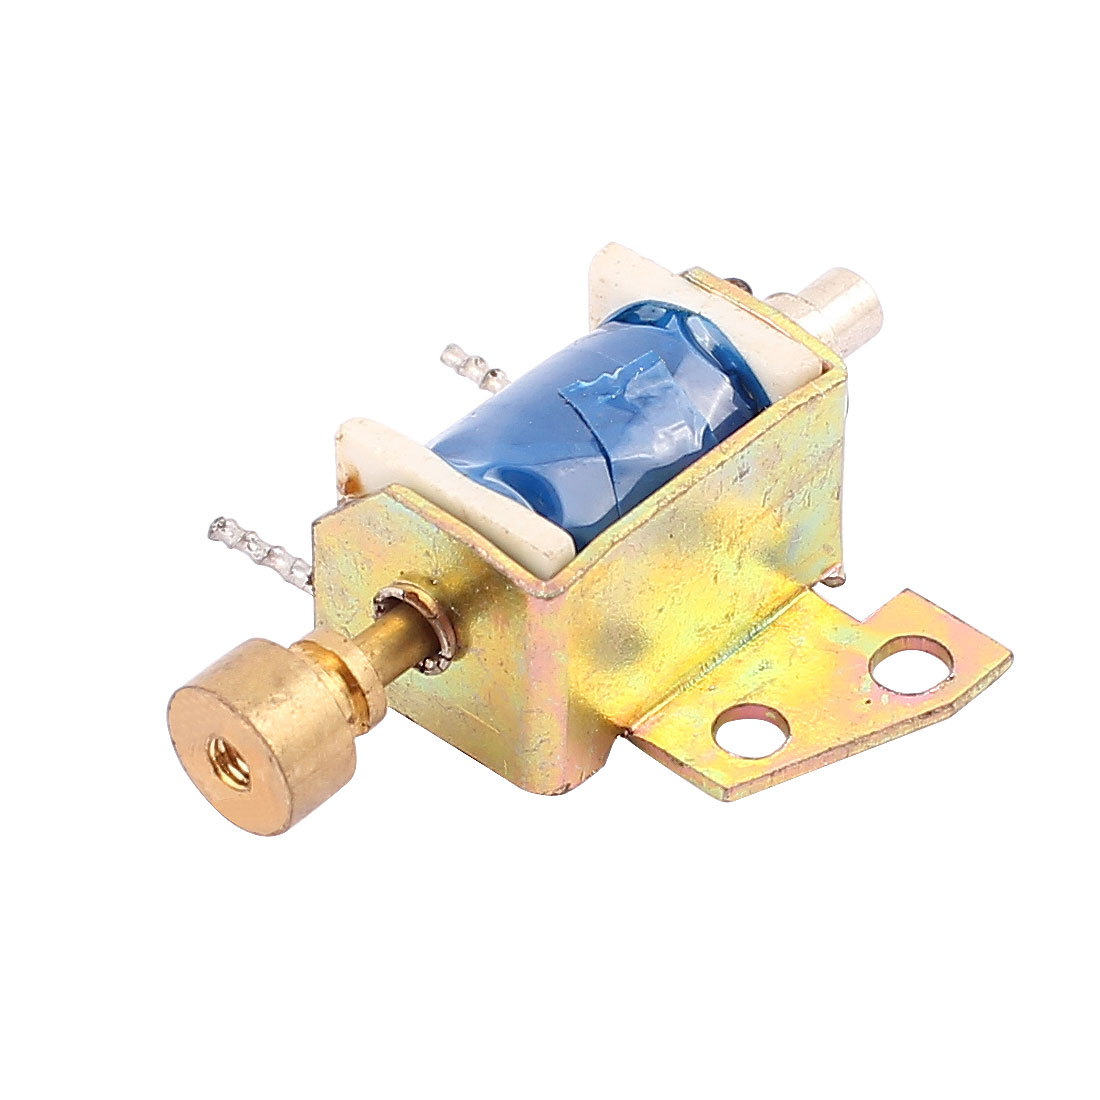 TAU-0416 DC12V 2N Push Pull Type DIY DC Open Frame Solenoid Electromagnet Magnet